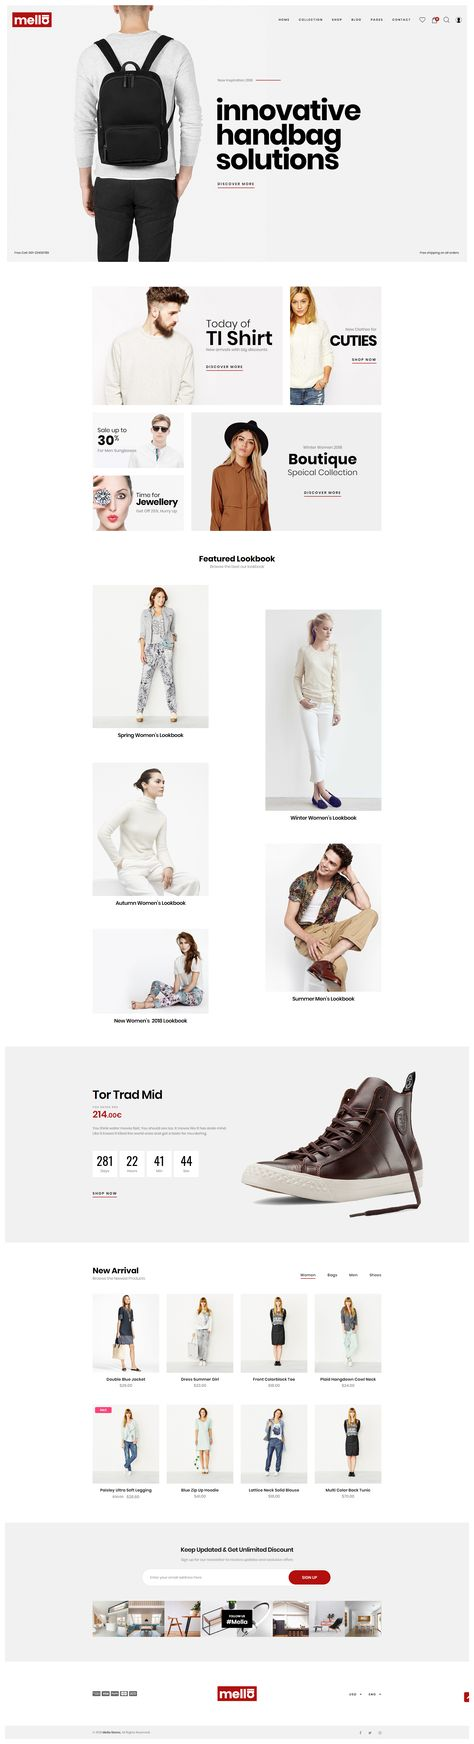 Mella - Minimalist Prestashop Theme #Ad #Minimalist, #Mella, #Theme, #Prestashop